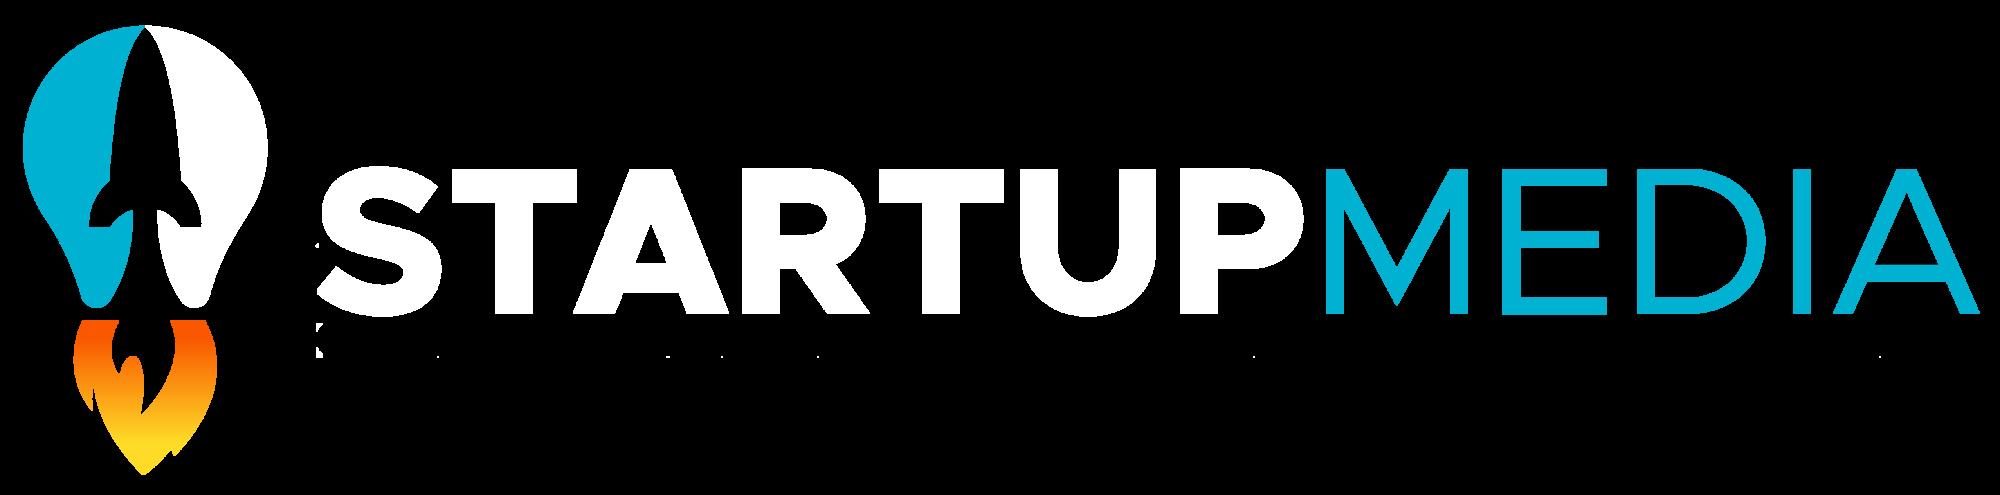 StartupMedia transparent, white, uden logo